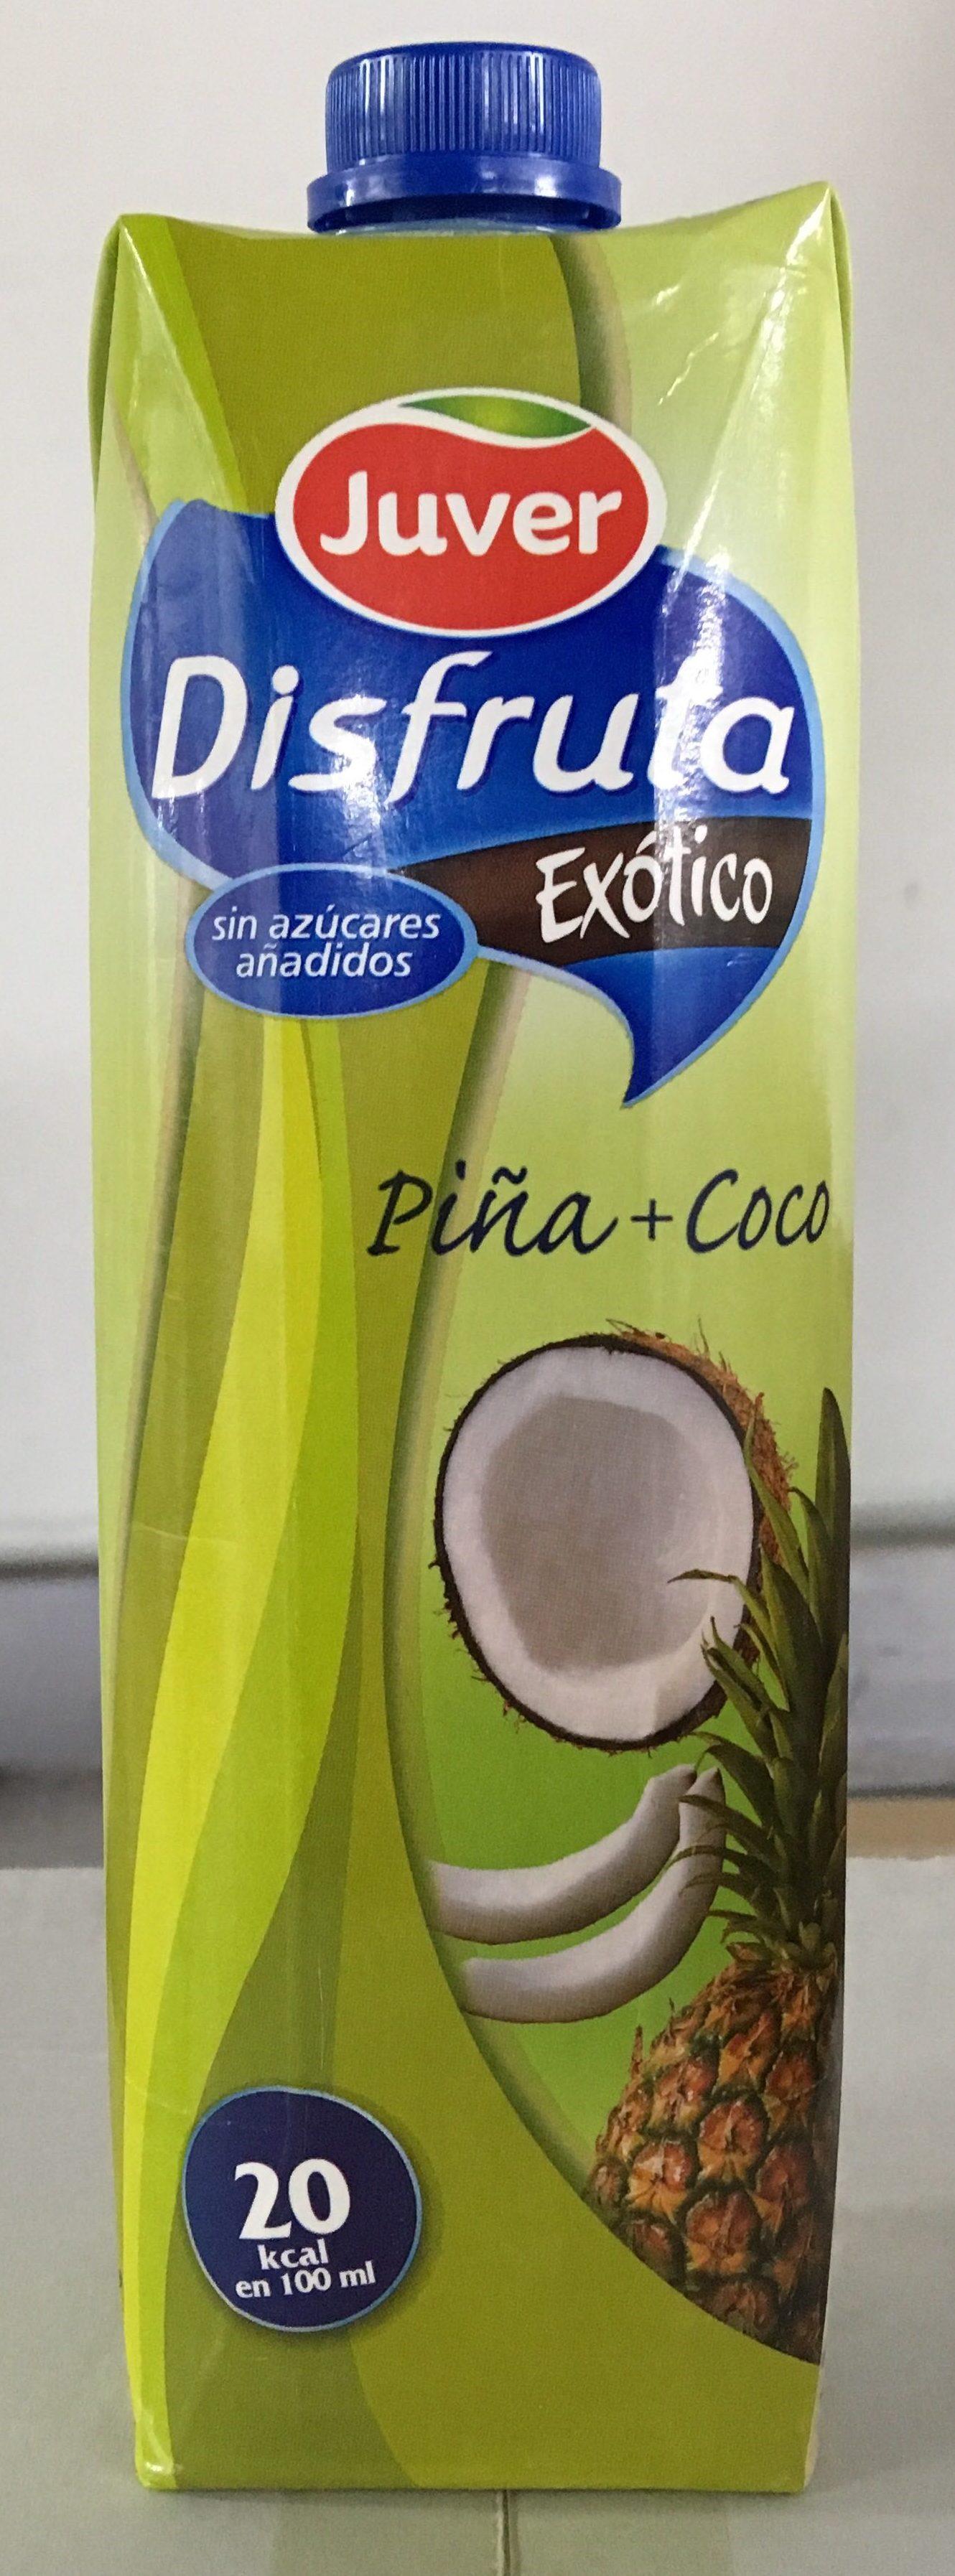 Exótico néctar de piña y coco sin azúcares añadidos - Producte - fr